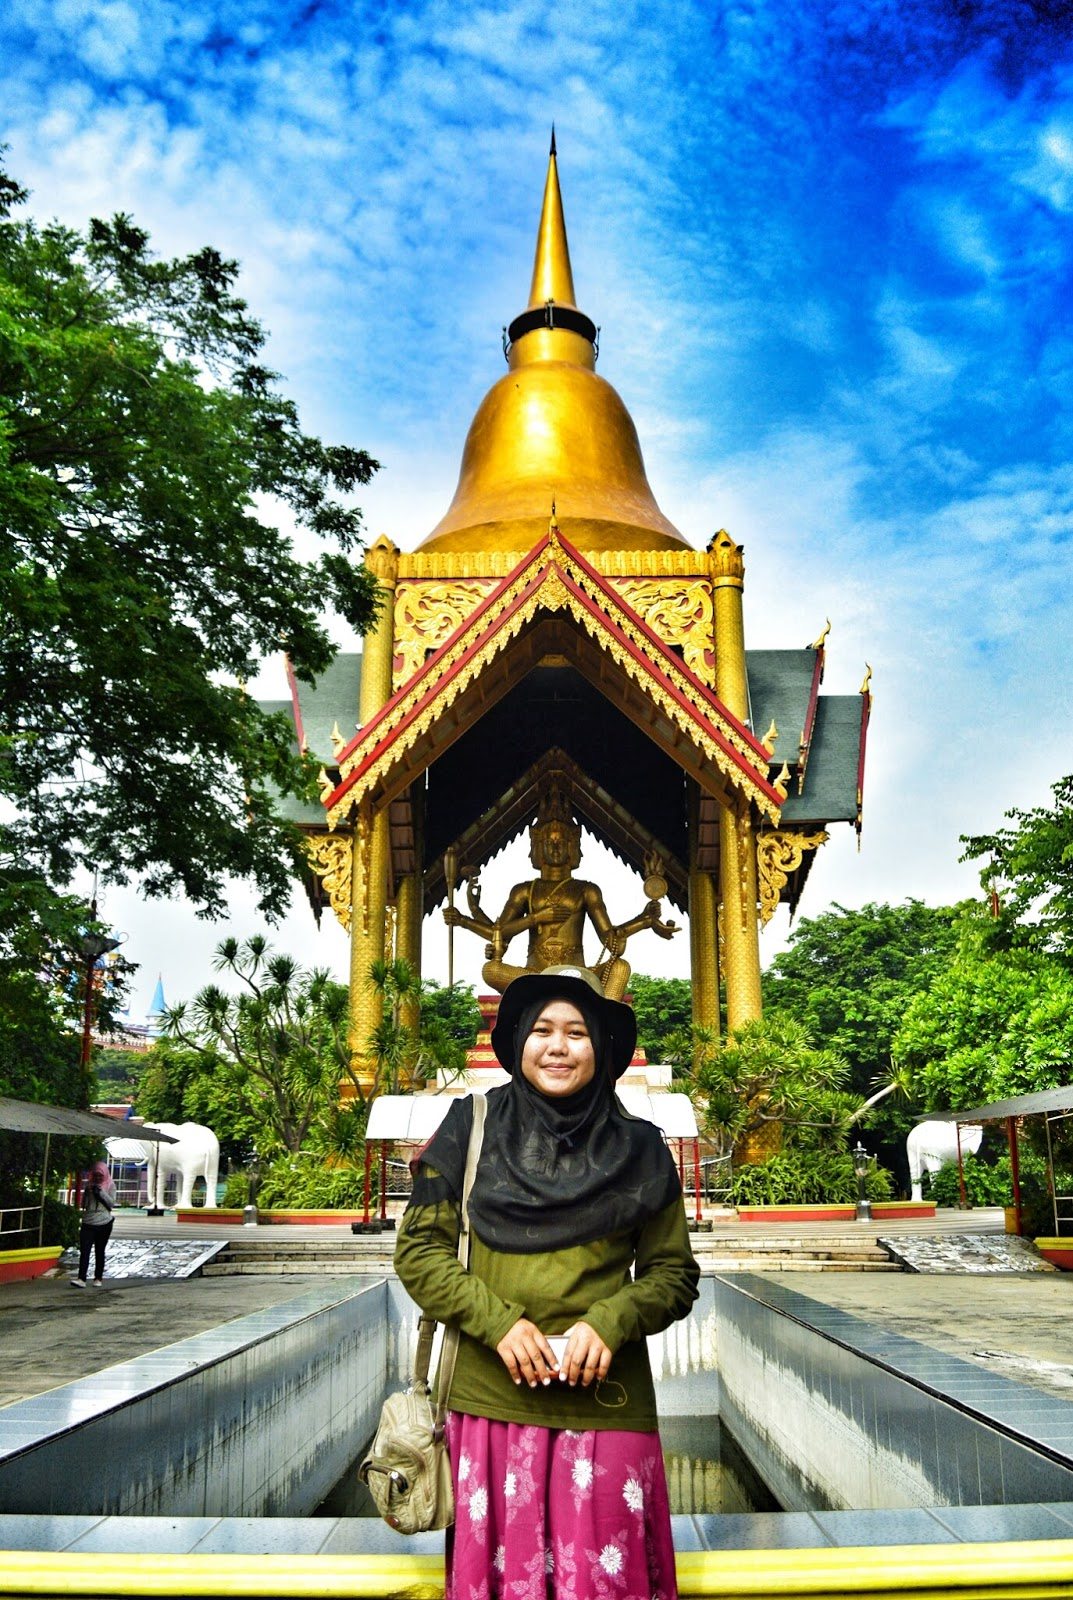 Surabaya Rasa Thailand Patung Buddha 4 Wajah Kenpark Copyright Nuidcriptograph